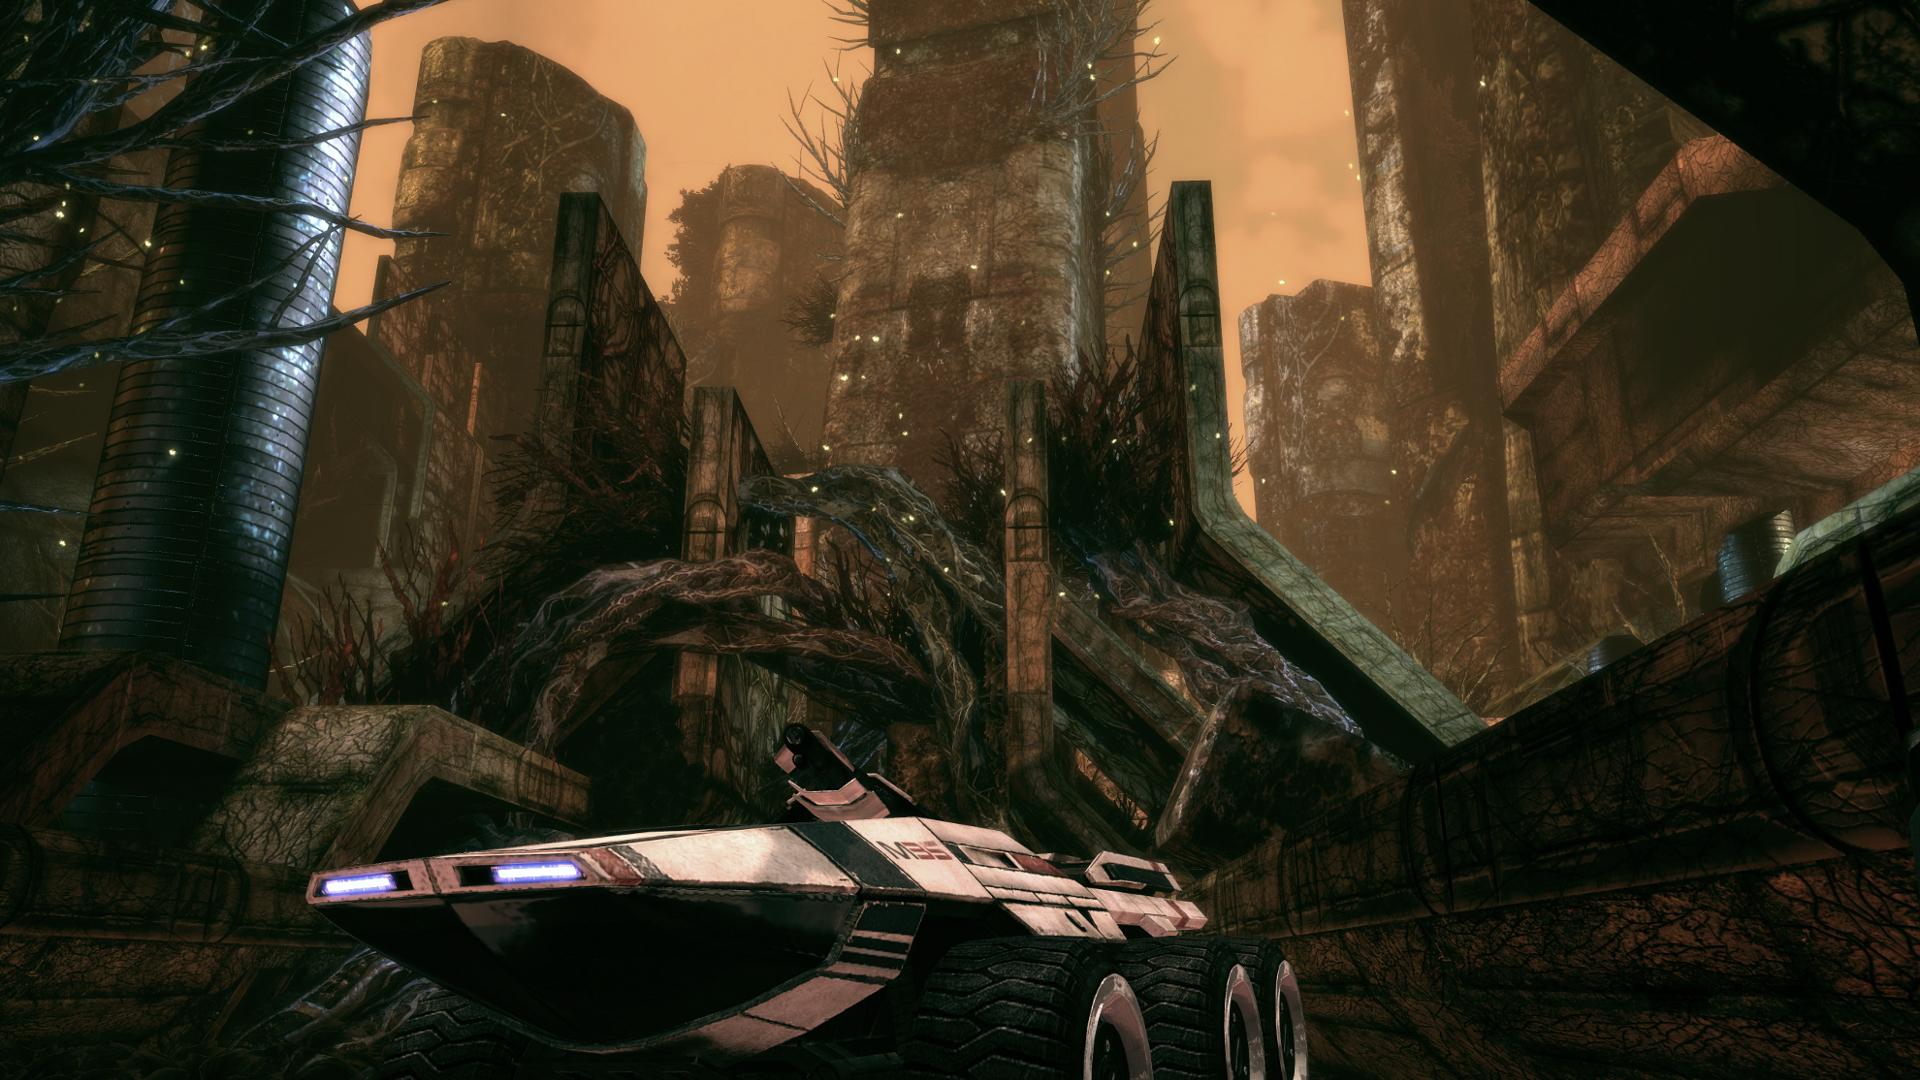 Mass Effect - Ilos